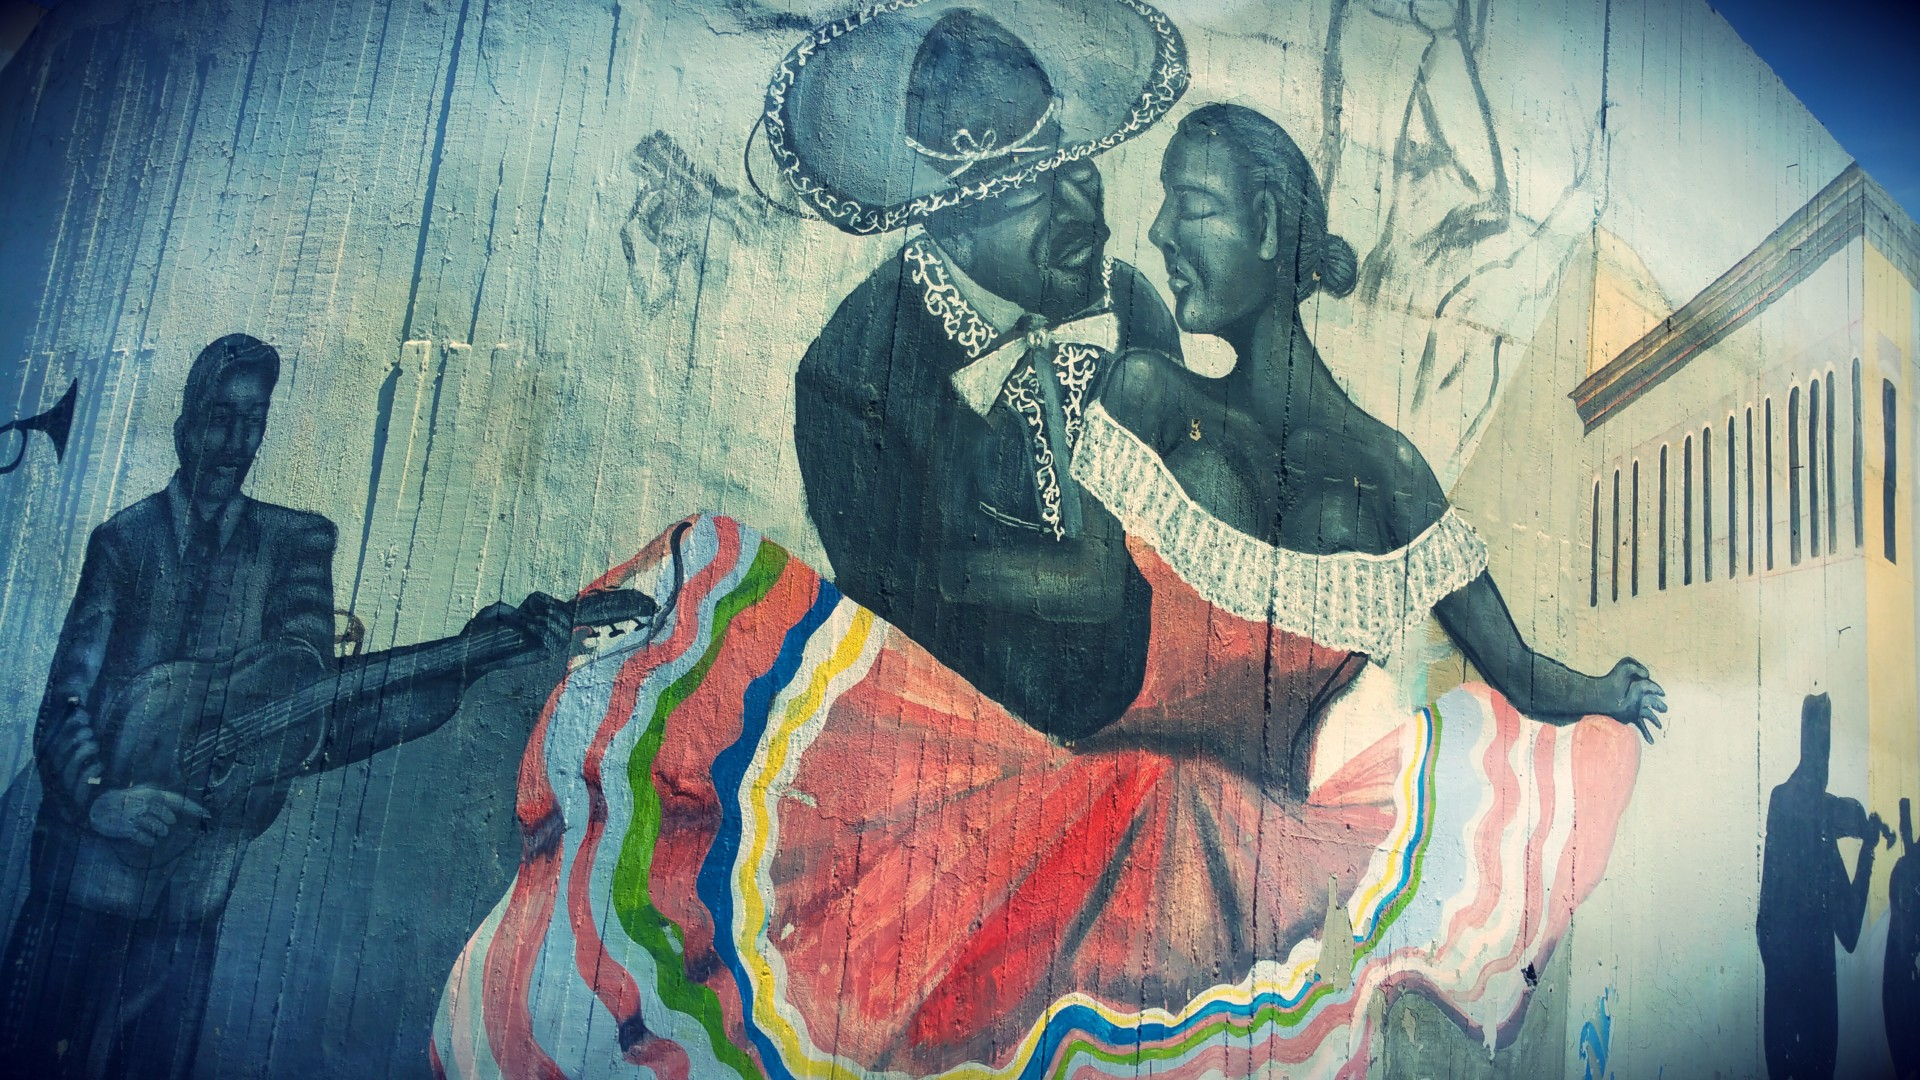 Mariachi Music in Mexico